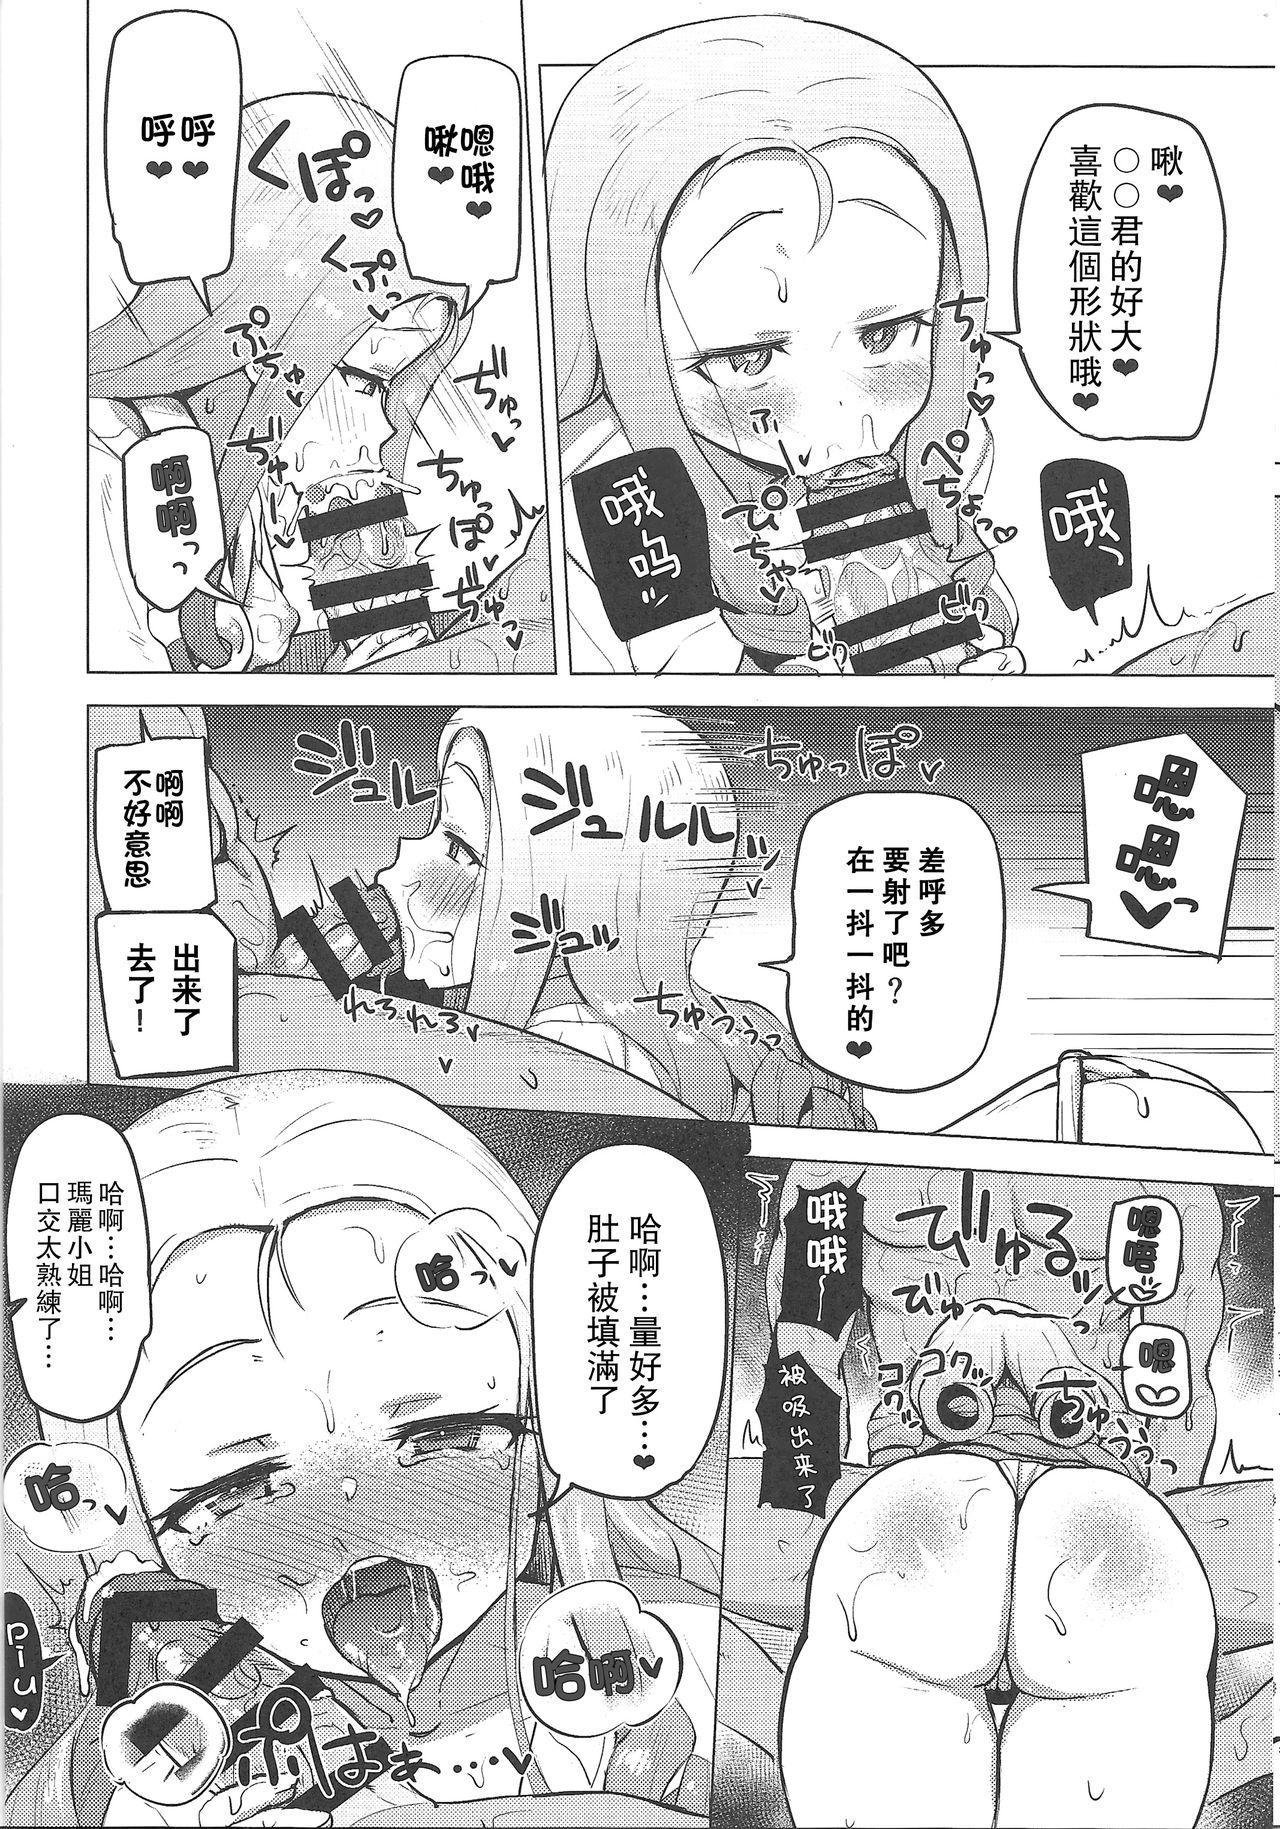 Onsen, Gokuraku, Marie-sama. 10